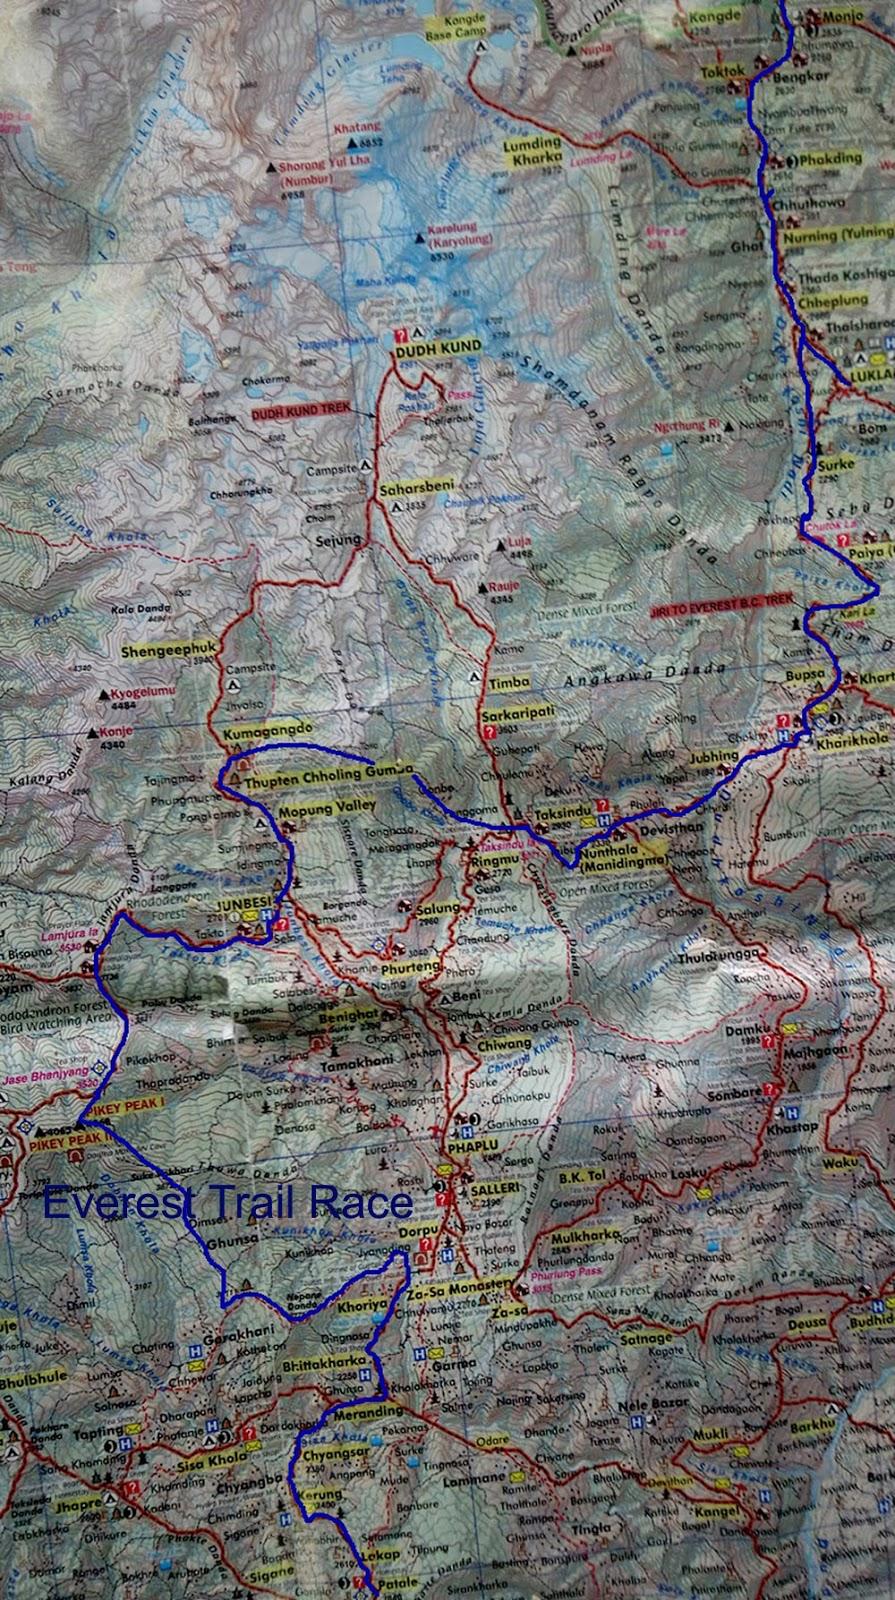 Everest Trail Race Route